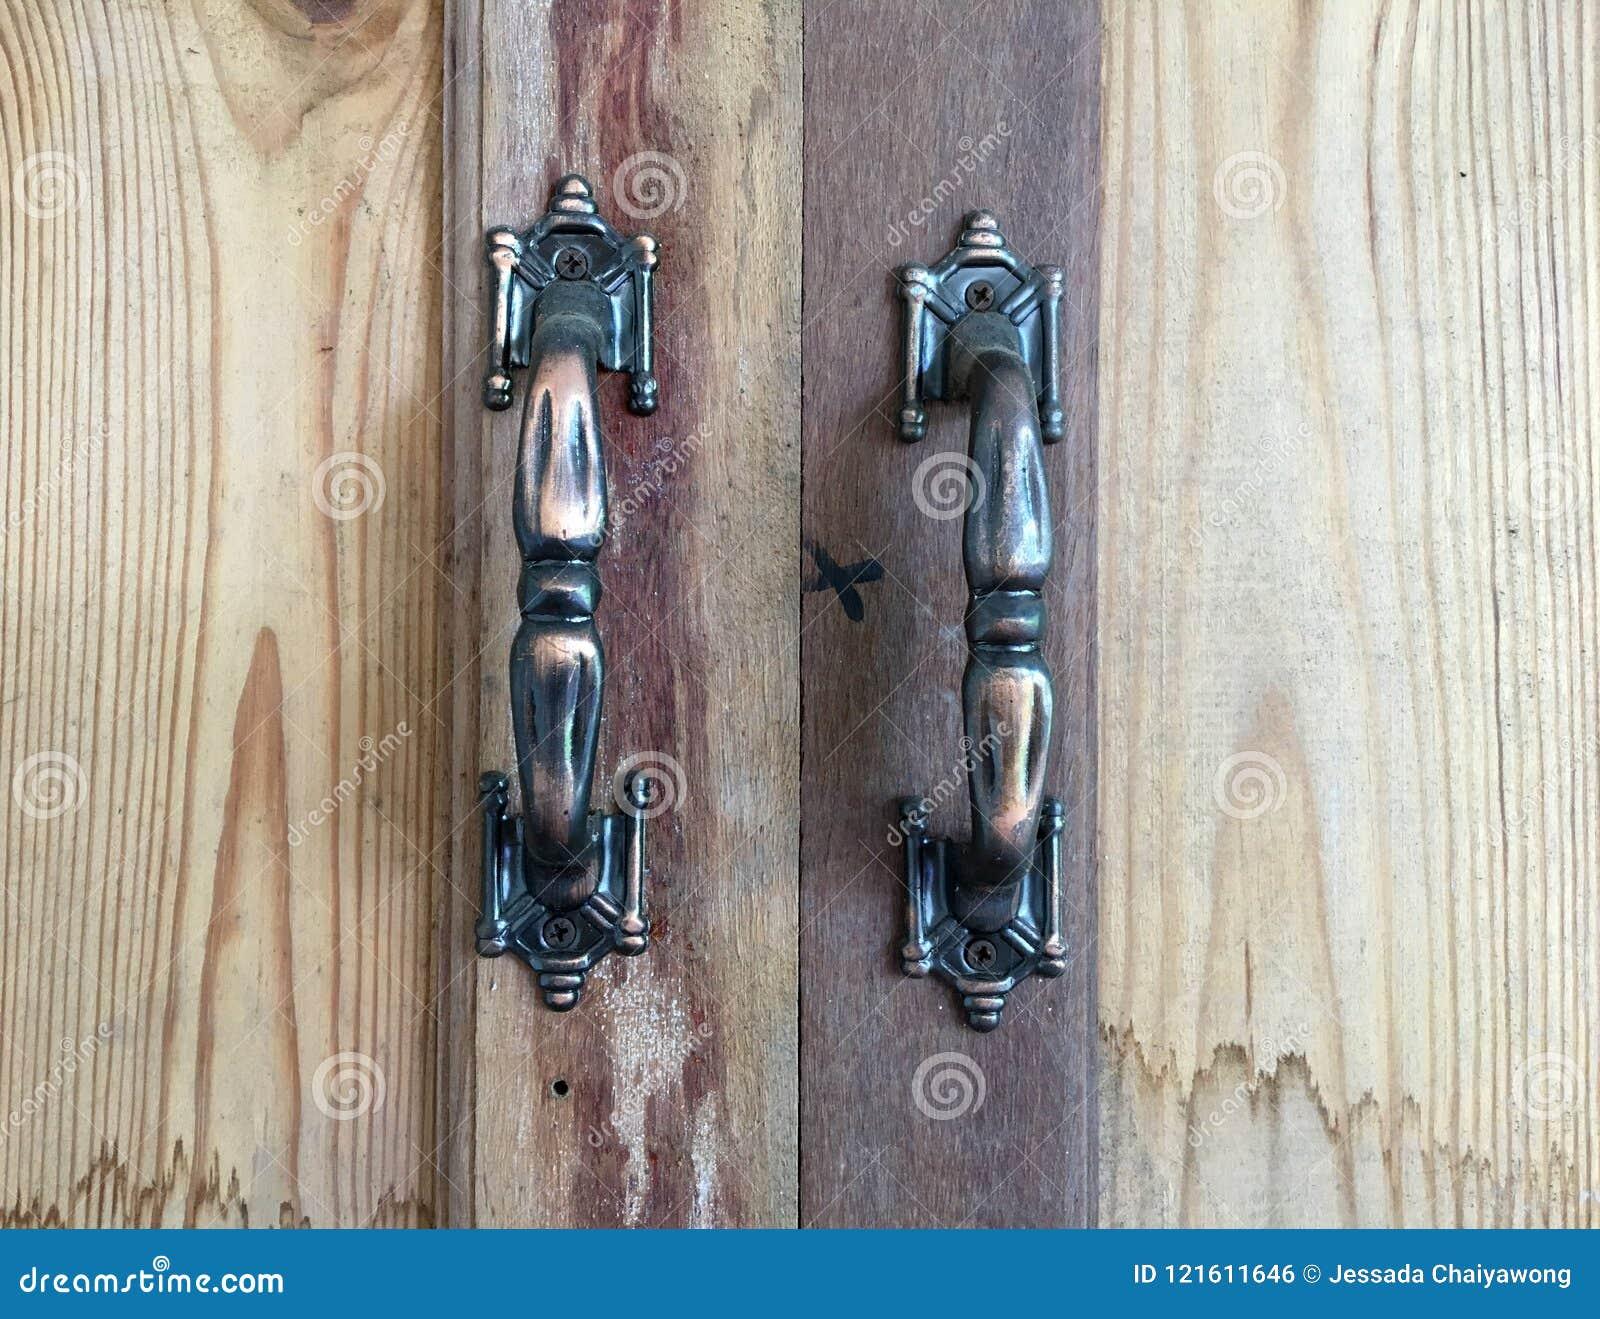 Oude staalhandvatten op houten kast